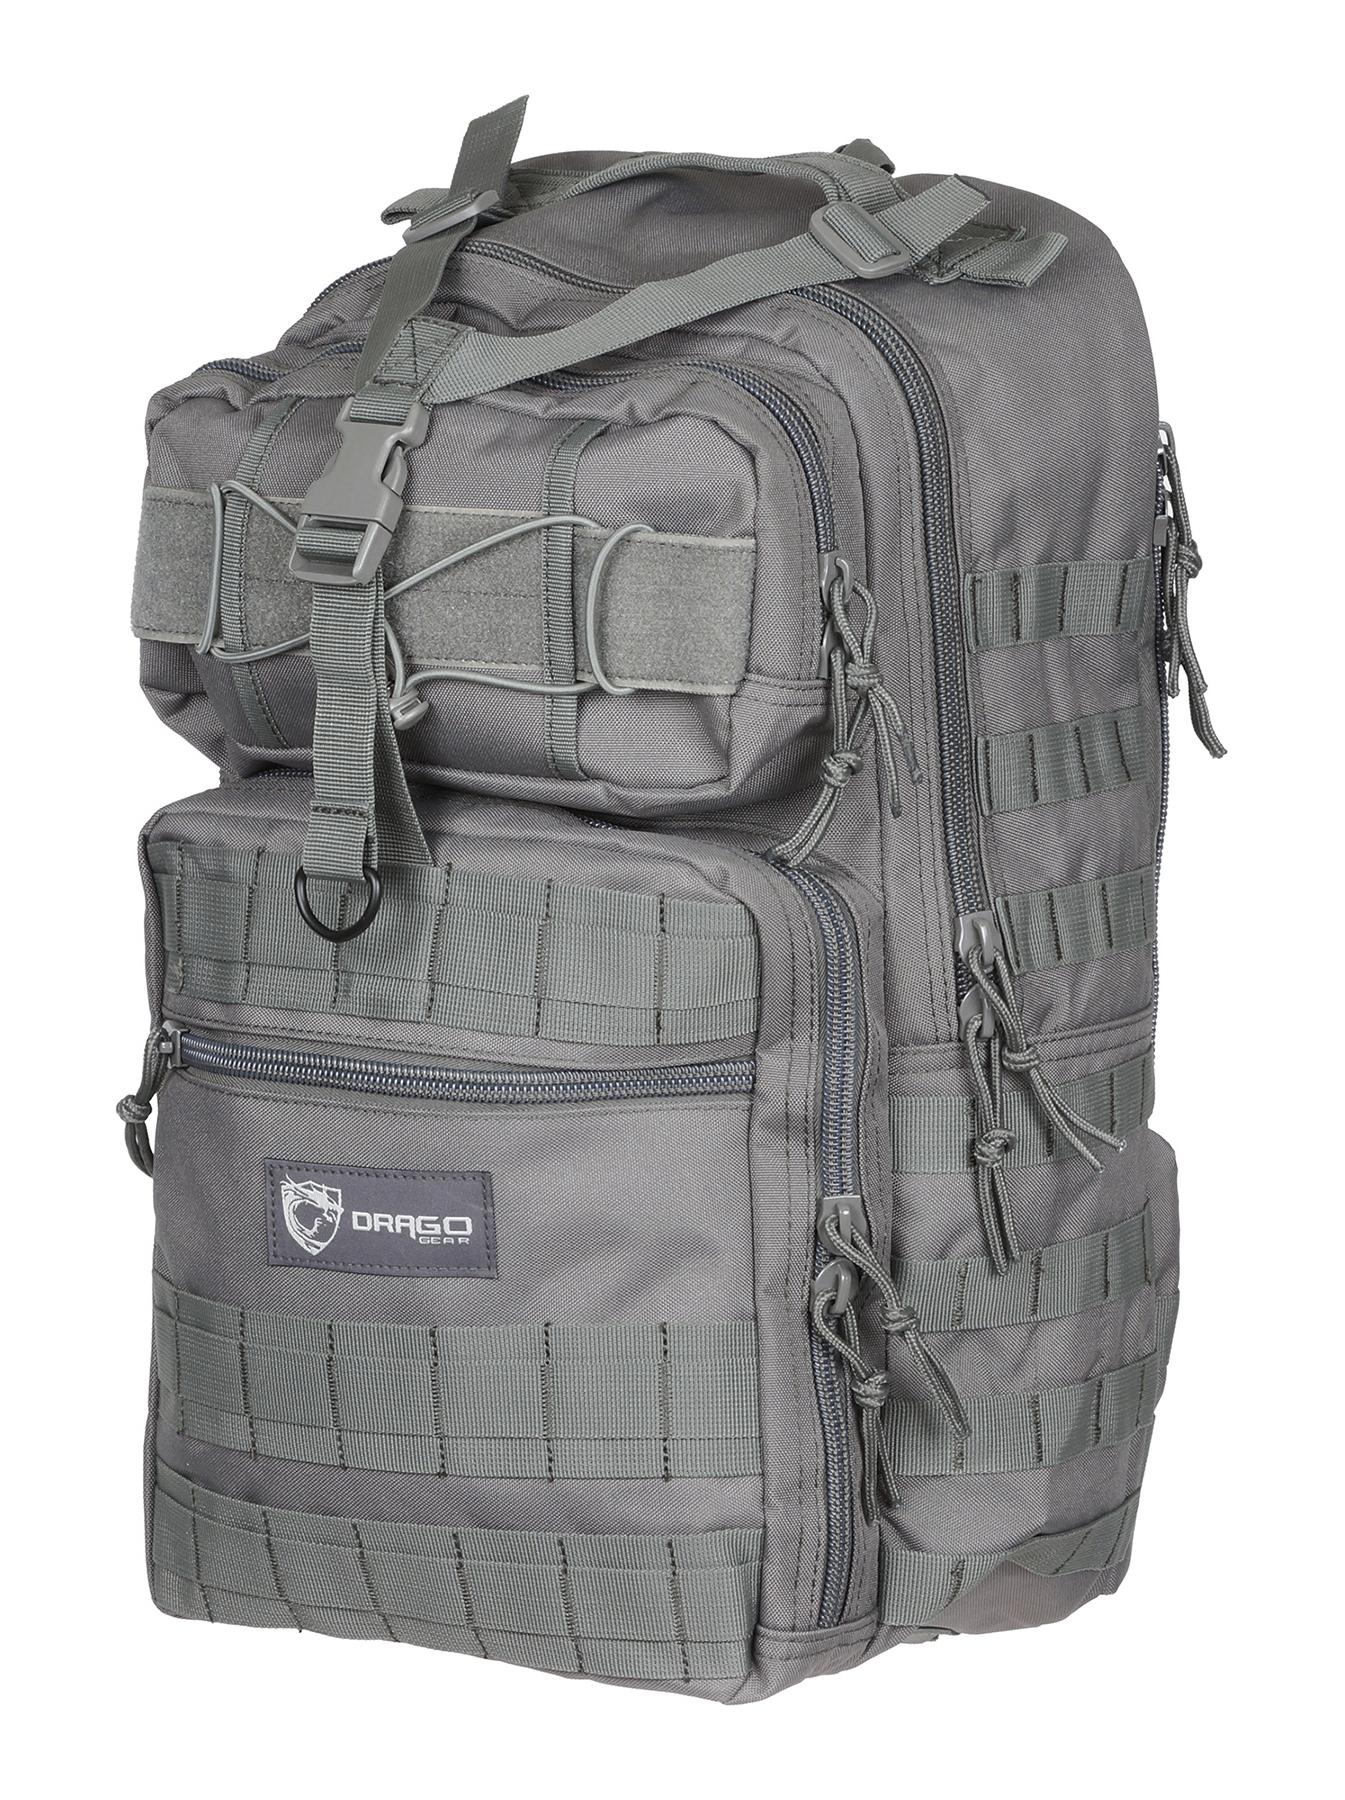 Atlus Sling™ Backpack - Drago Gear 6e5113159